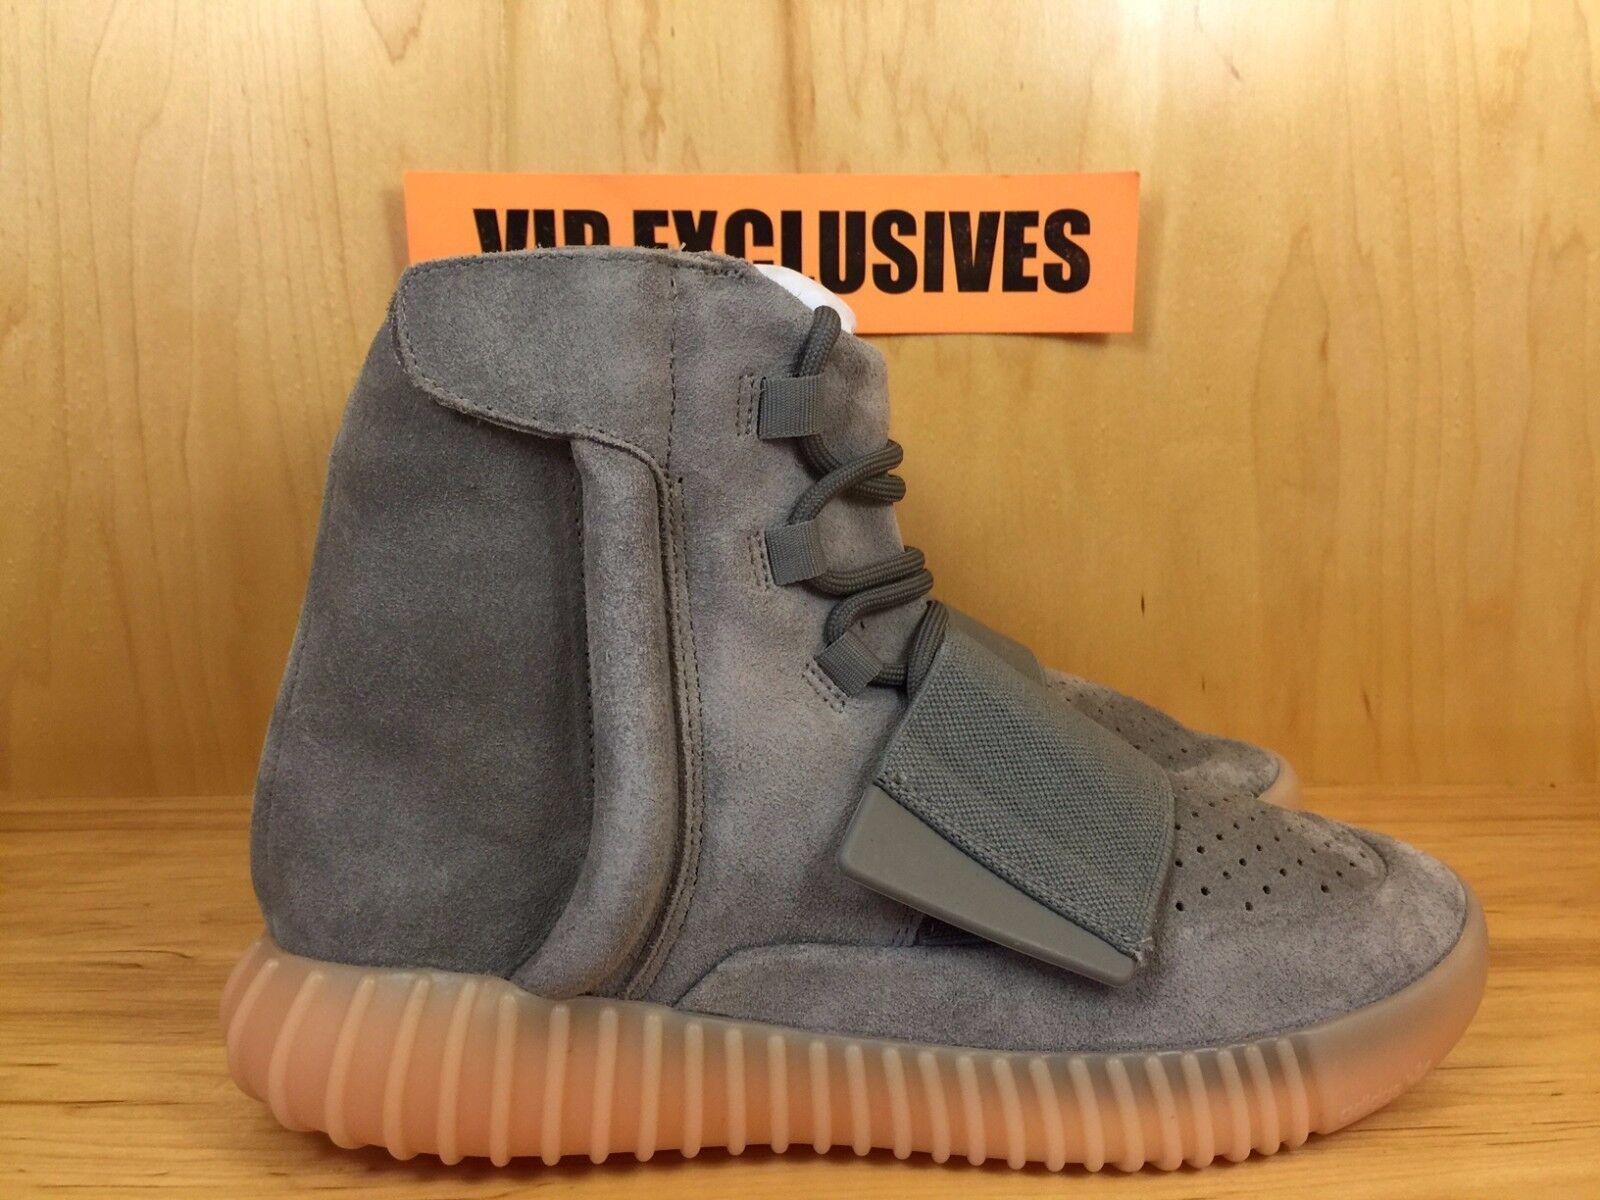 Adidas Yeezy 750 Boost Kanye West Light Grey Gum Glow In The Dark Suede BB1840